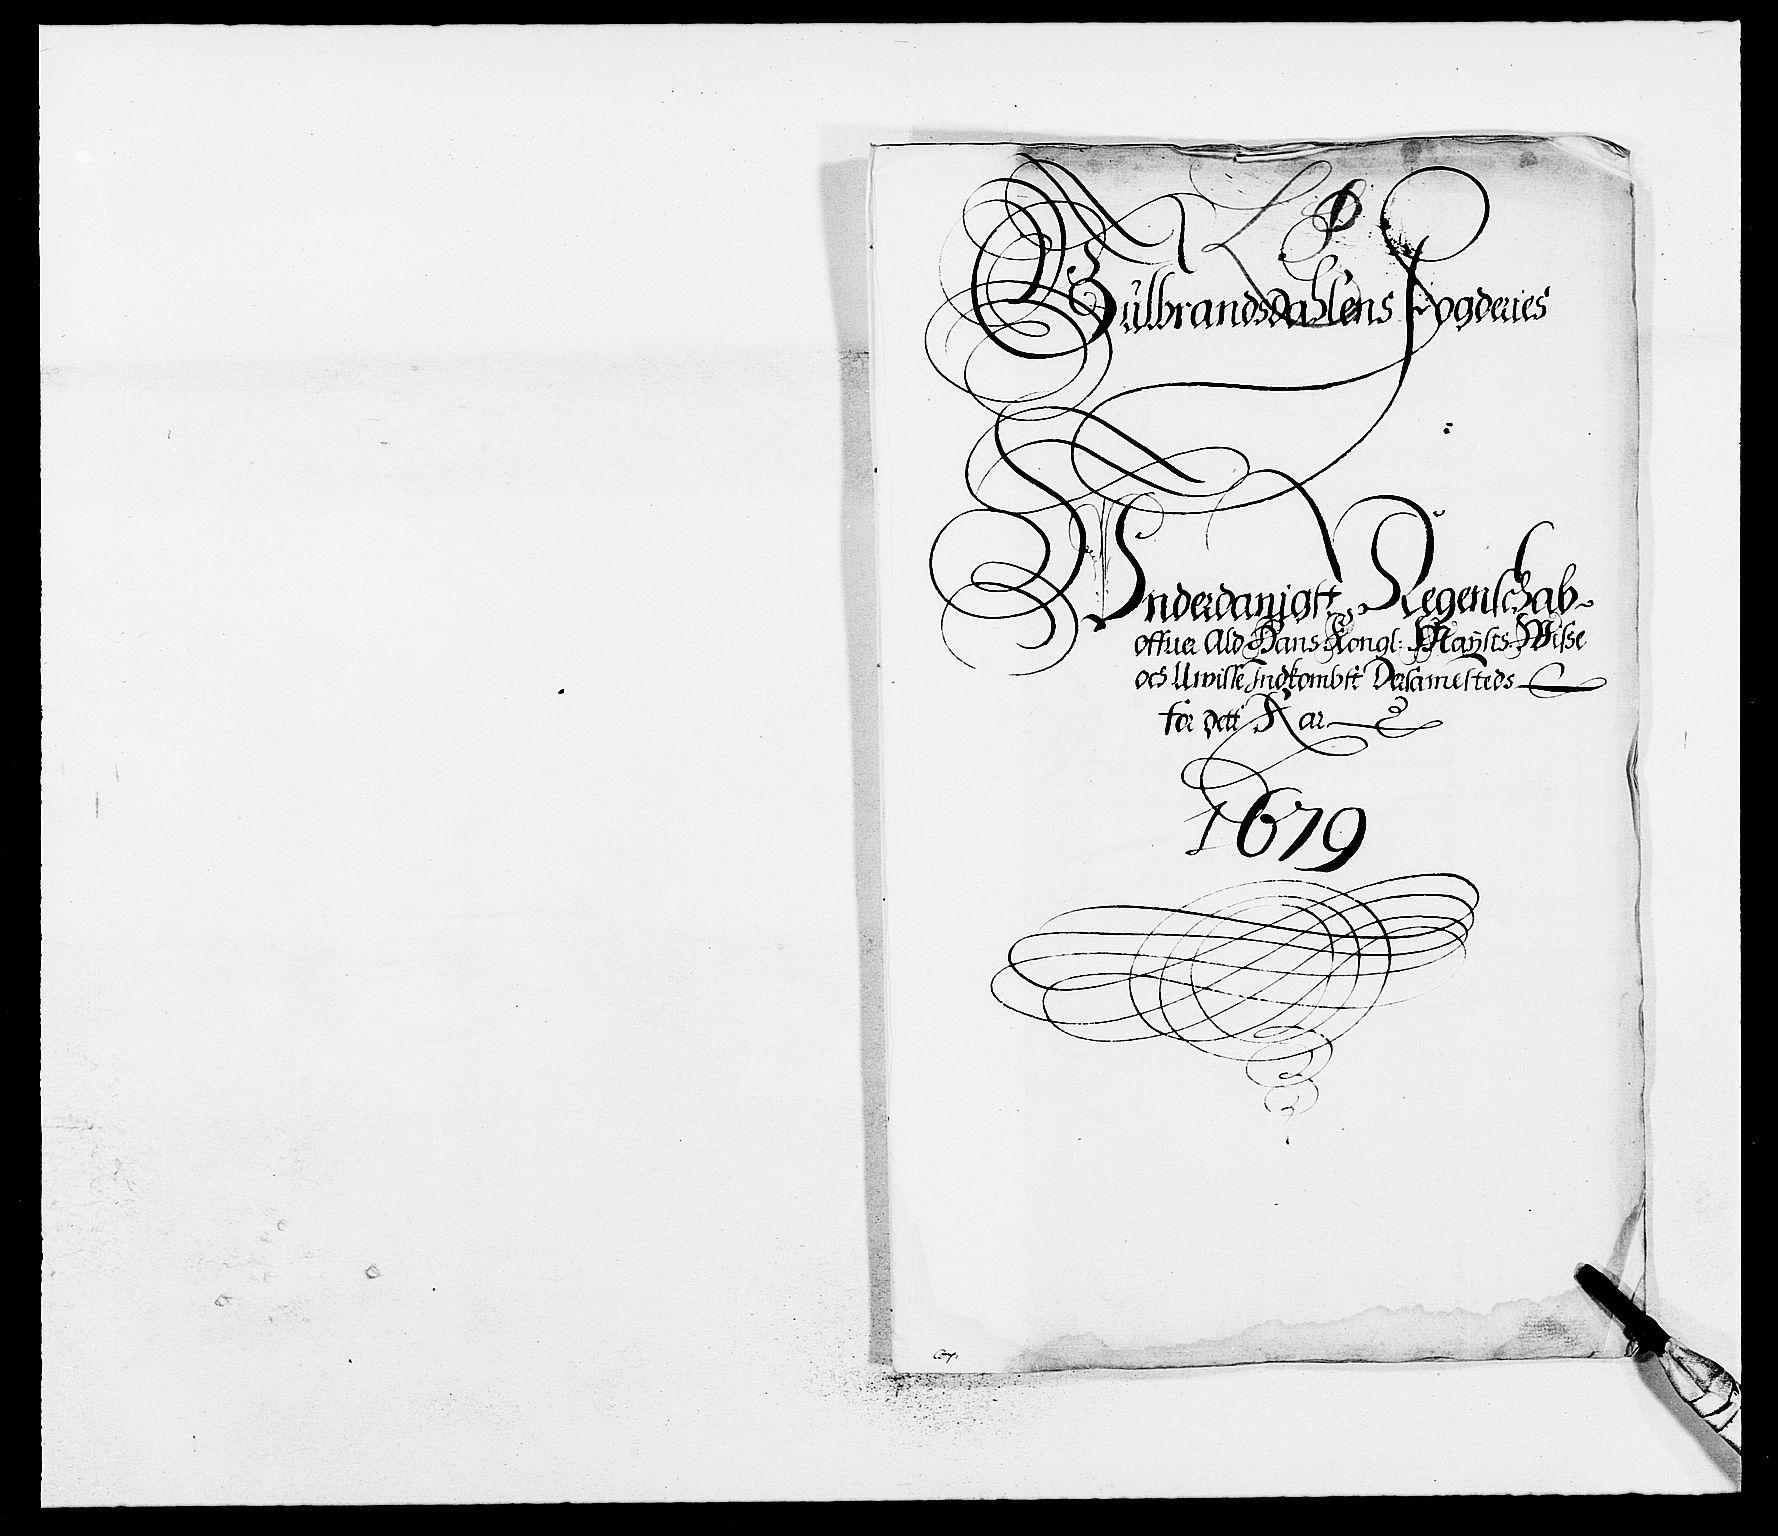 RA, Rentekammeret inntil 1814, Reviderte regnskaper, Fogderegnskap, R17/L1153: Fogderegnskap Gudbrandsdal, 1678-1679, s. 16